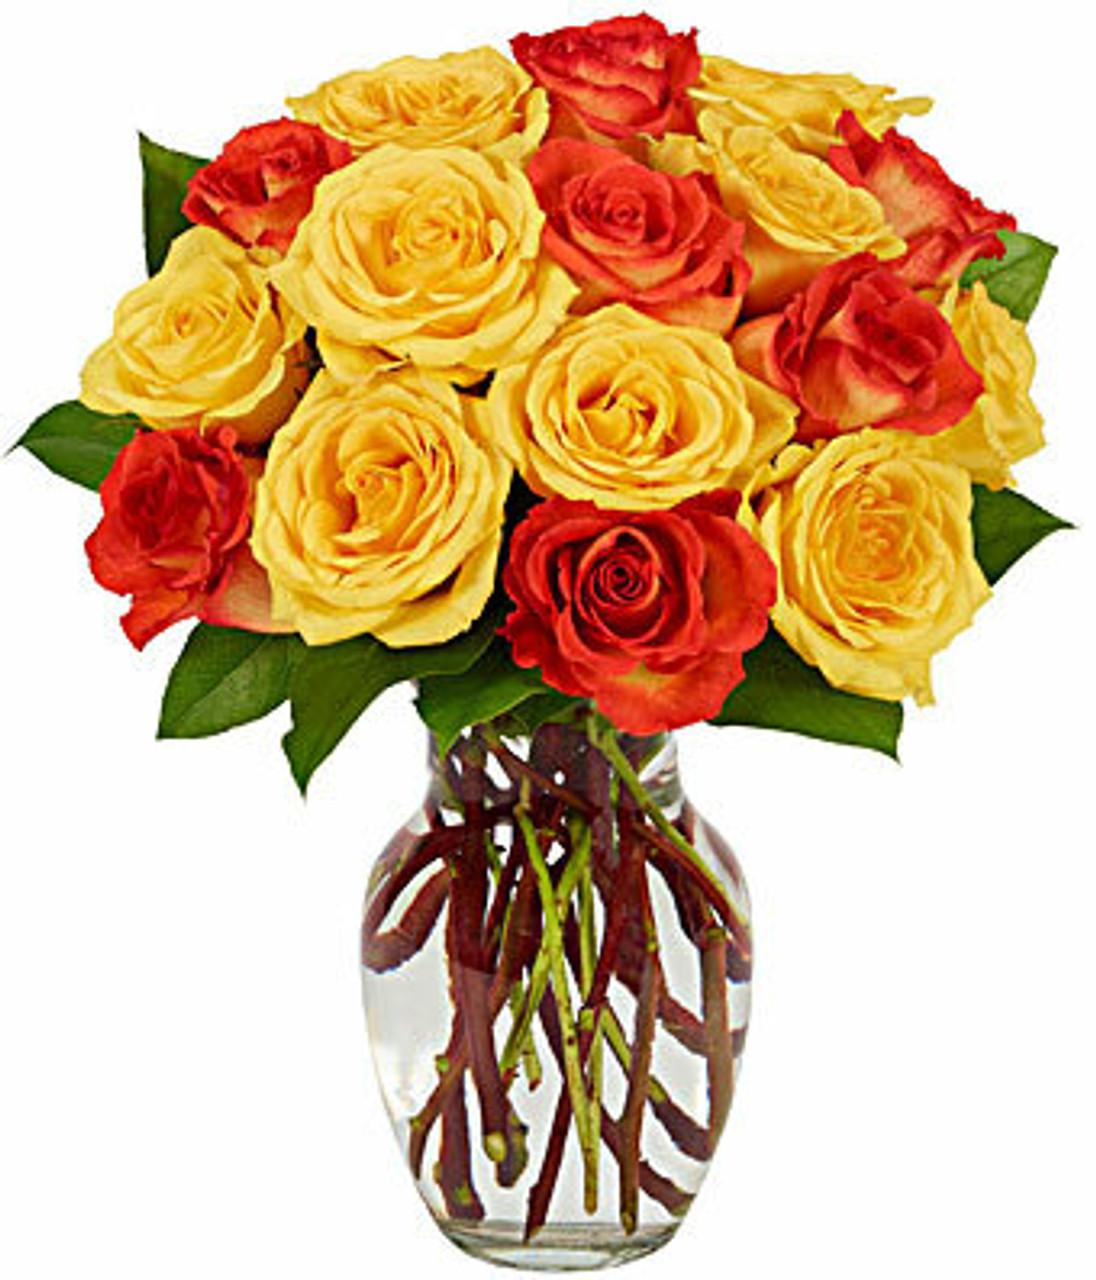 Orange & Yellow Ecuadorian Roses Bouquet